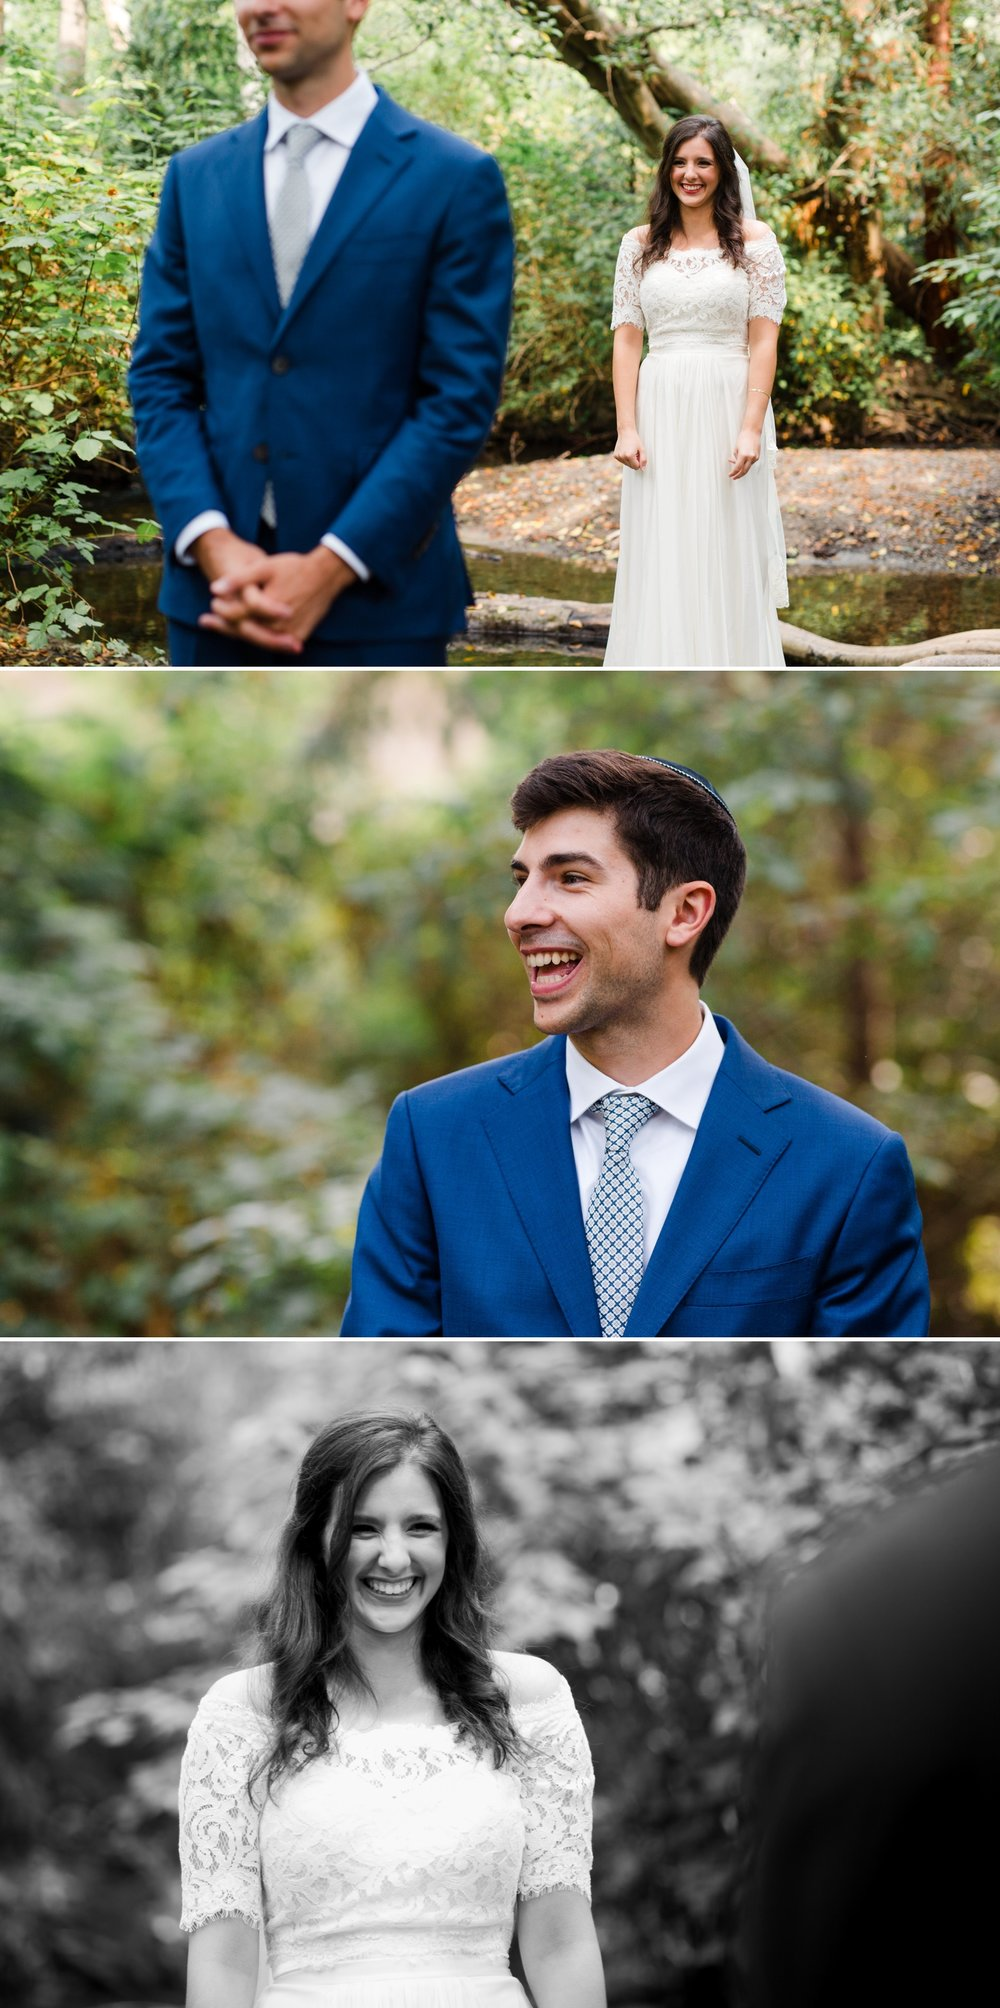 3-forest-wedding-seattle-first-look.jpg